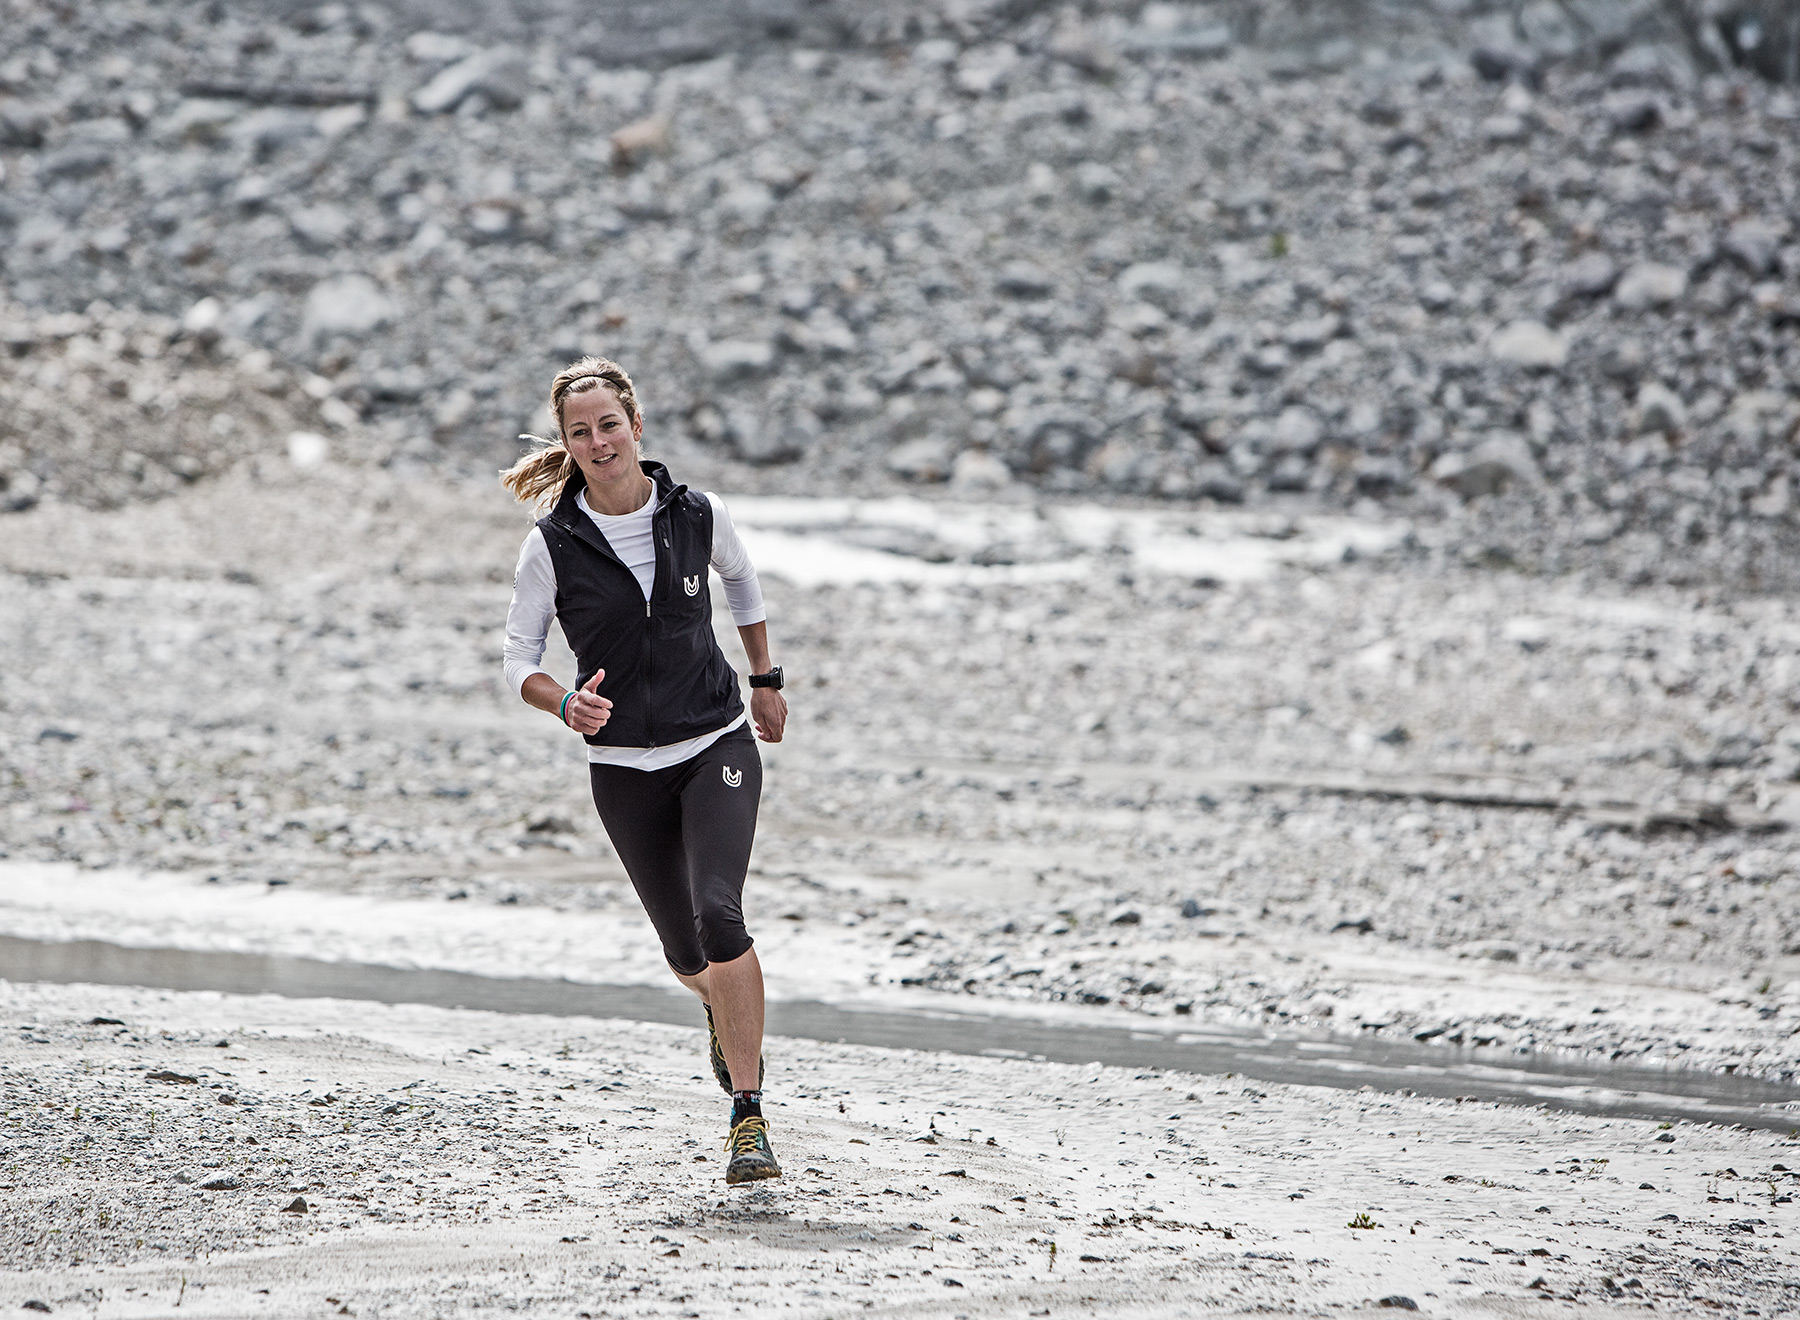 14-UVU-Anne-Marie-Flammersfeld-Running-Engadin